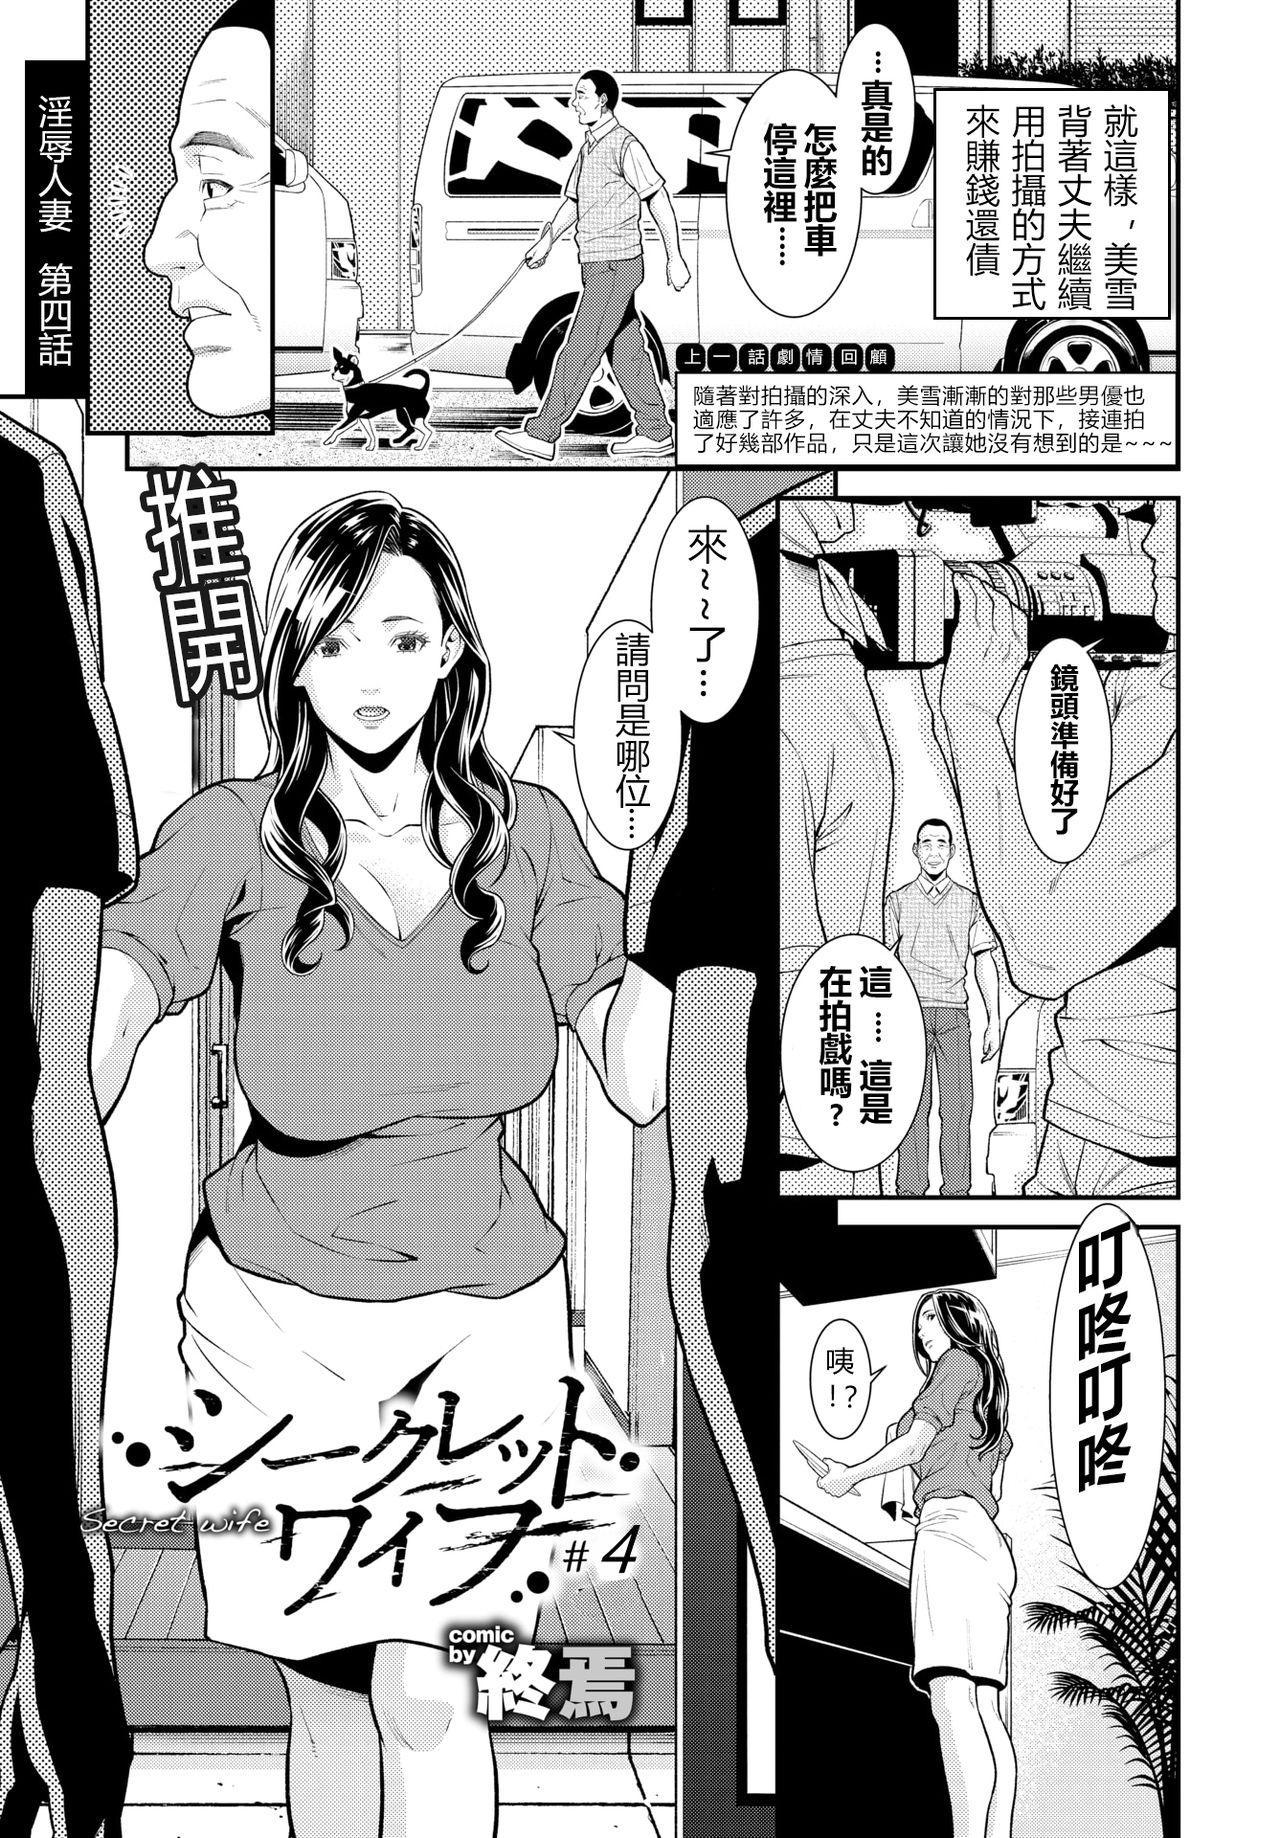 [Syuuen] Secret Wife  1-6 [Chinese][鼠灣漢化](210206最新修复完整版)【極品人妻NTR】 51